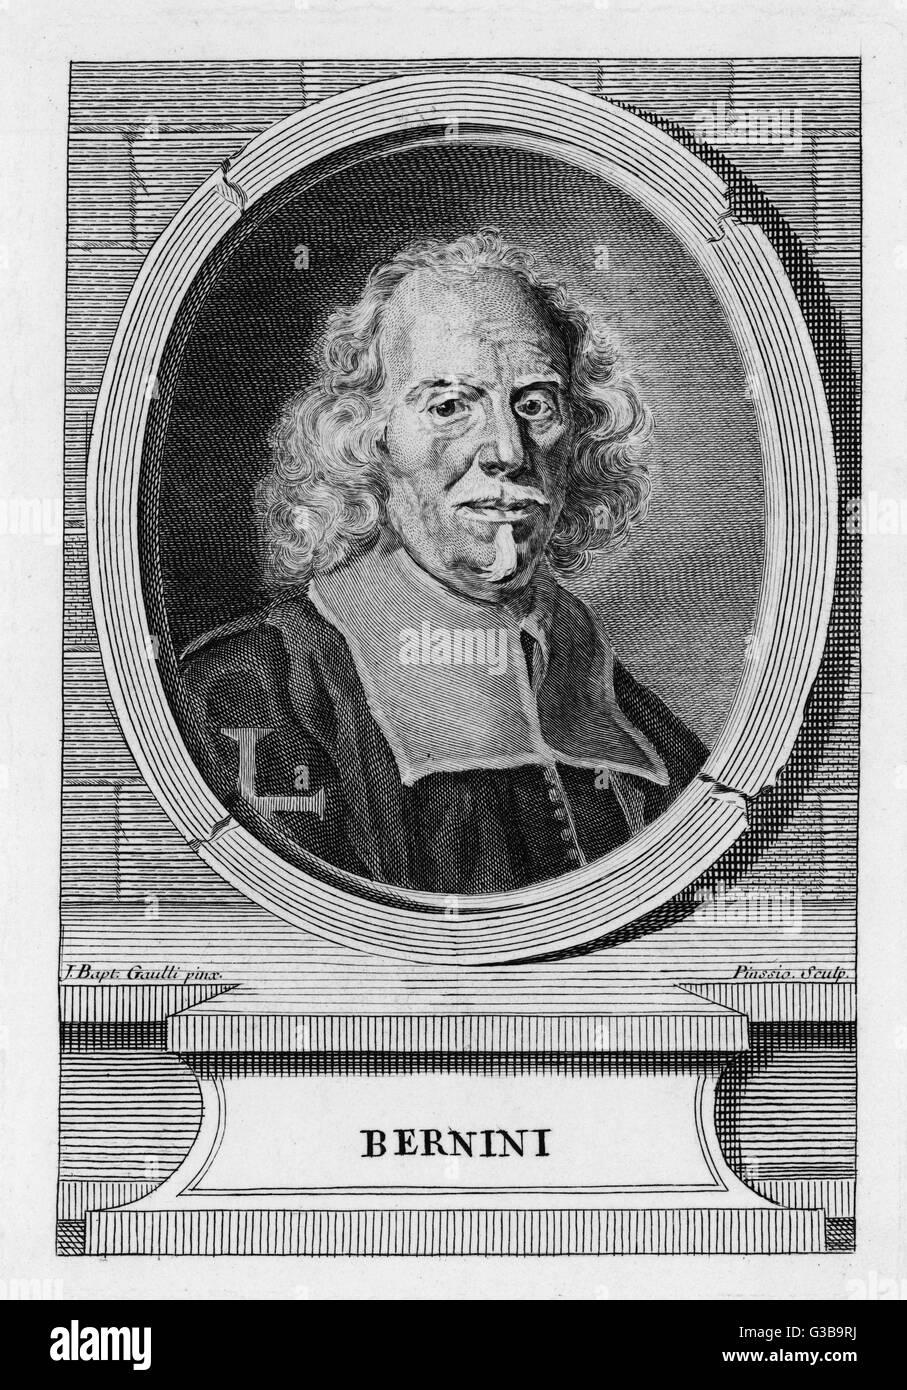 GIOVANNI LORENZO BERNINI  Italian architect, sculptor  and painter.       Date: 1598 - 1680 - Stock Image